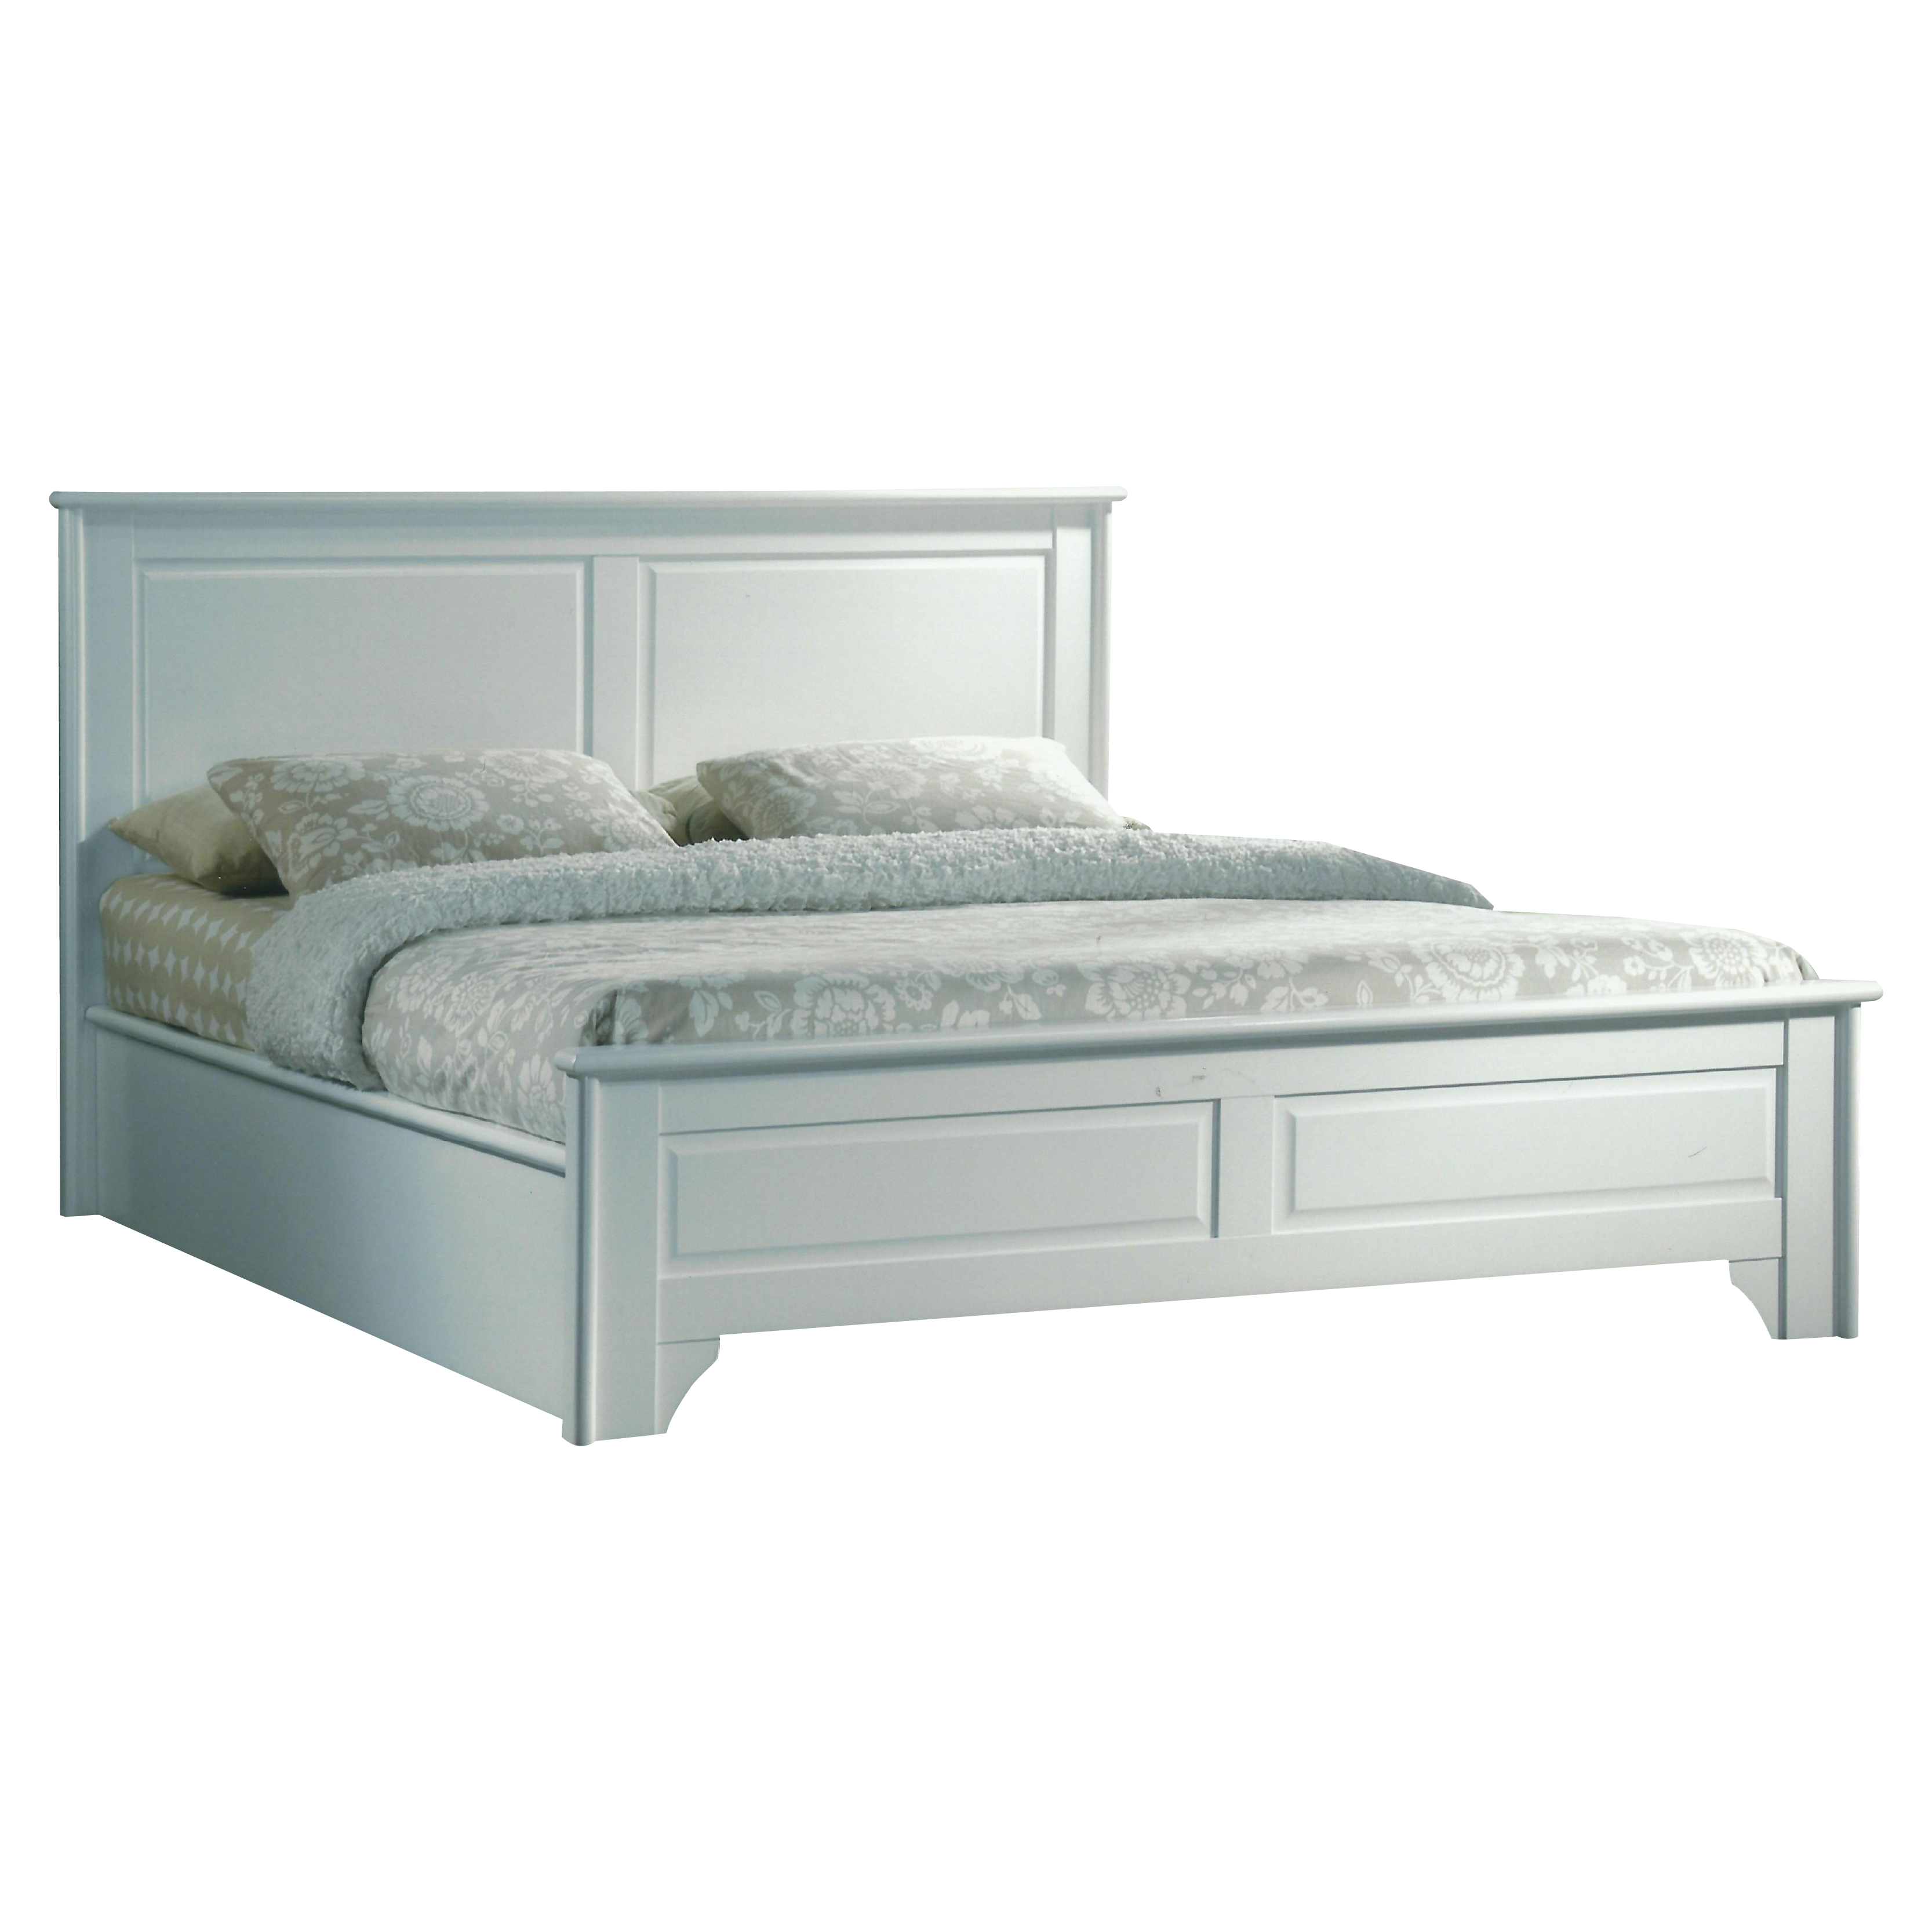 VIRGINIA queen size solid wood bedframe-white - FurnitureDirect.com.my